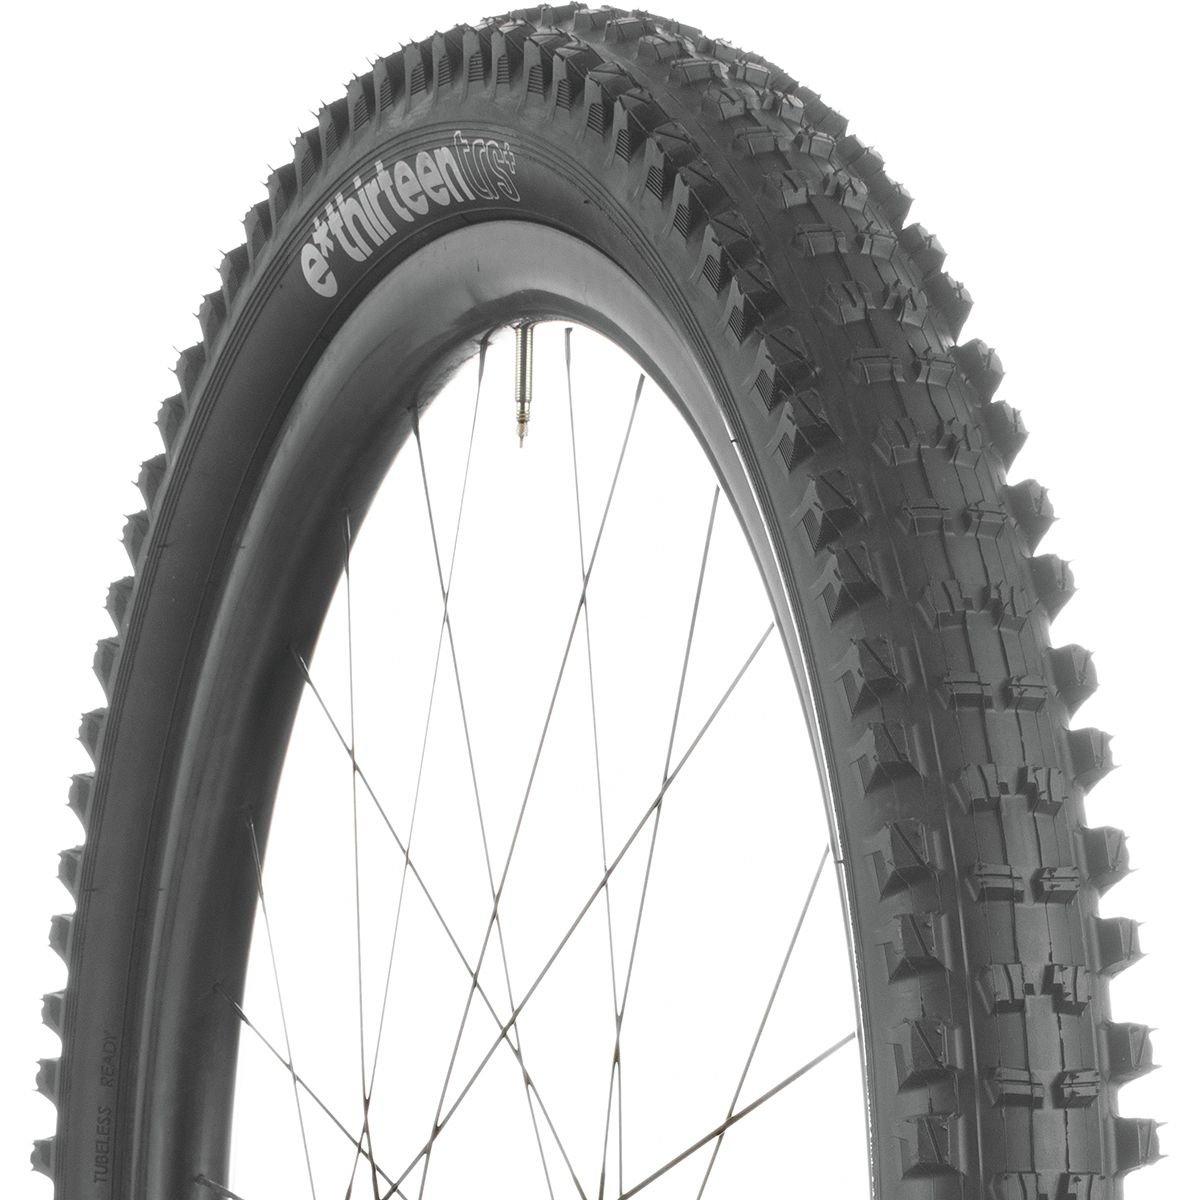 Ethirteen TRS +タイヤ、27.5 X 2.35、複合、デュアルSingle Ply Apex Aramid Reinforced B0785M33Q3